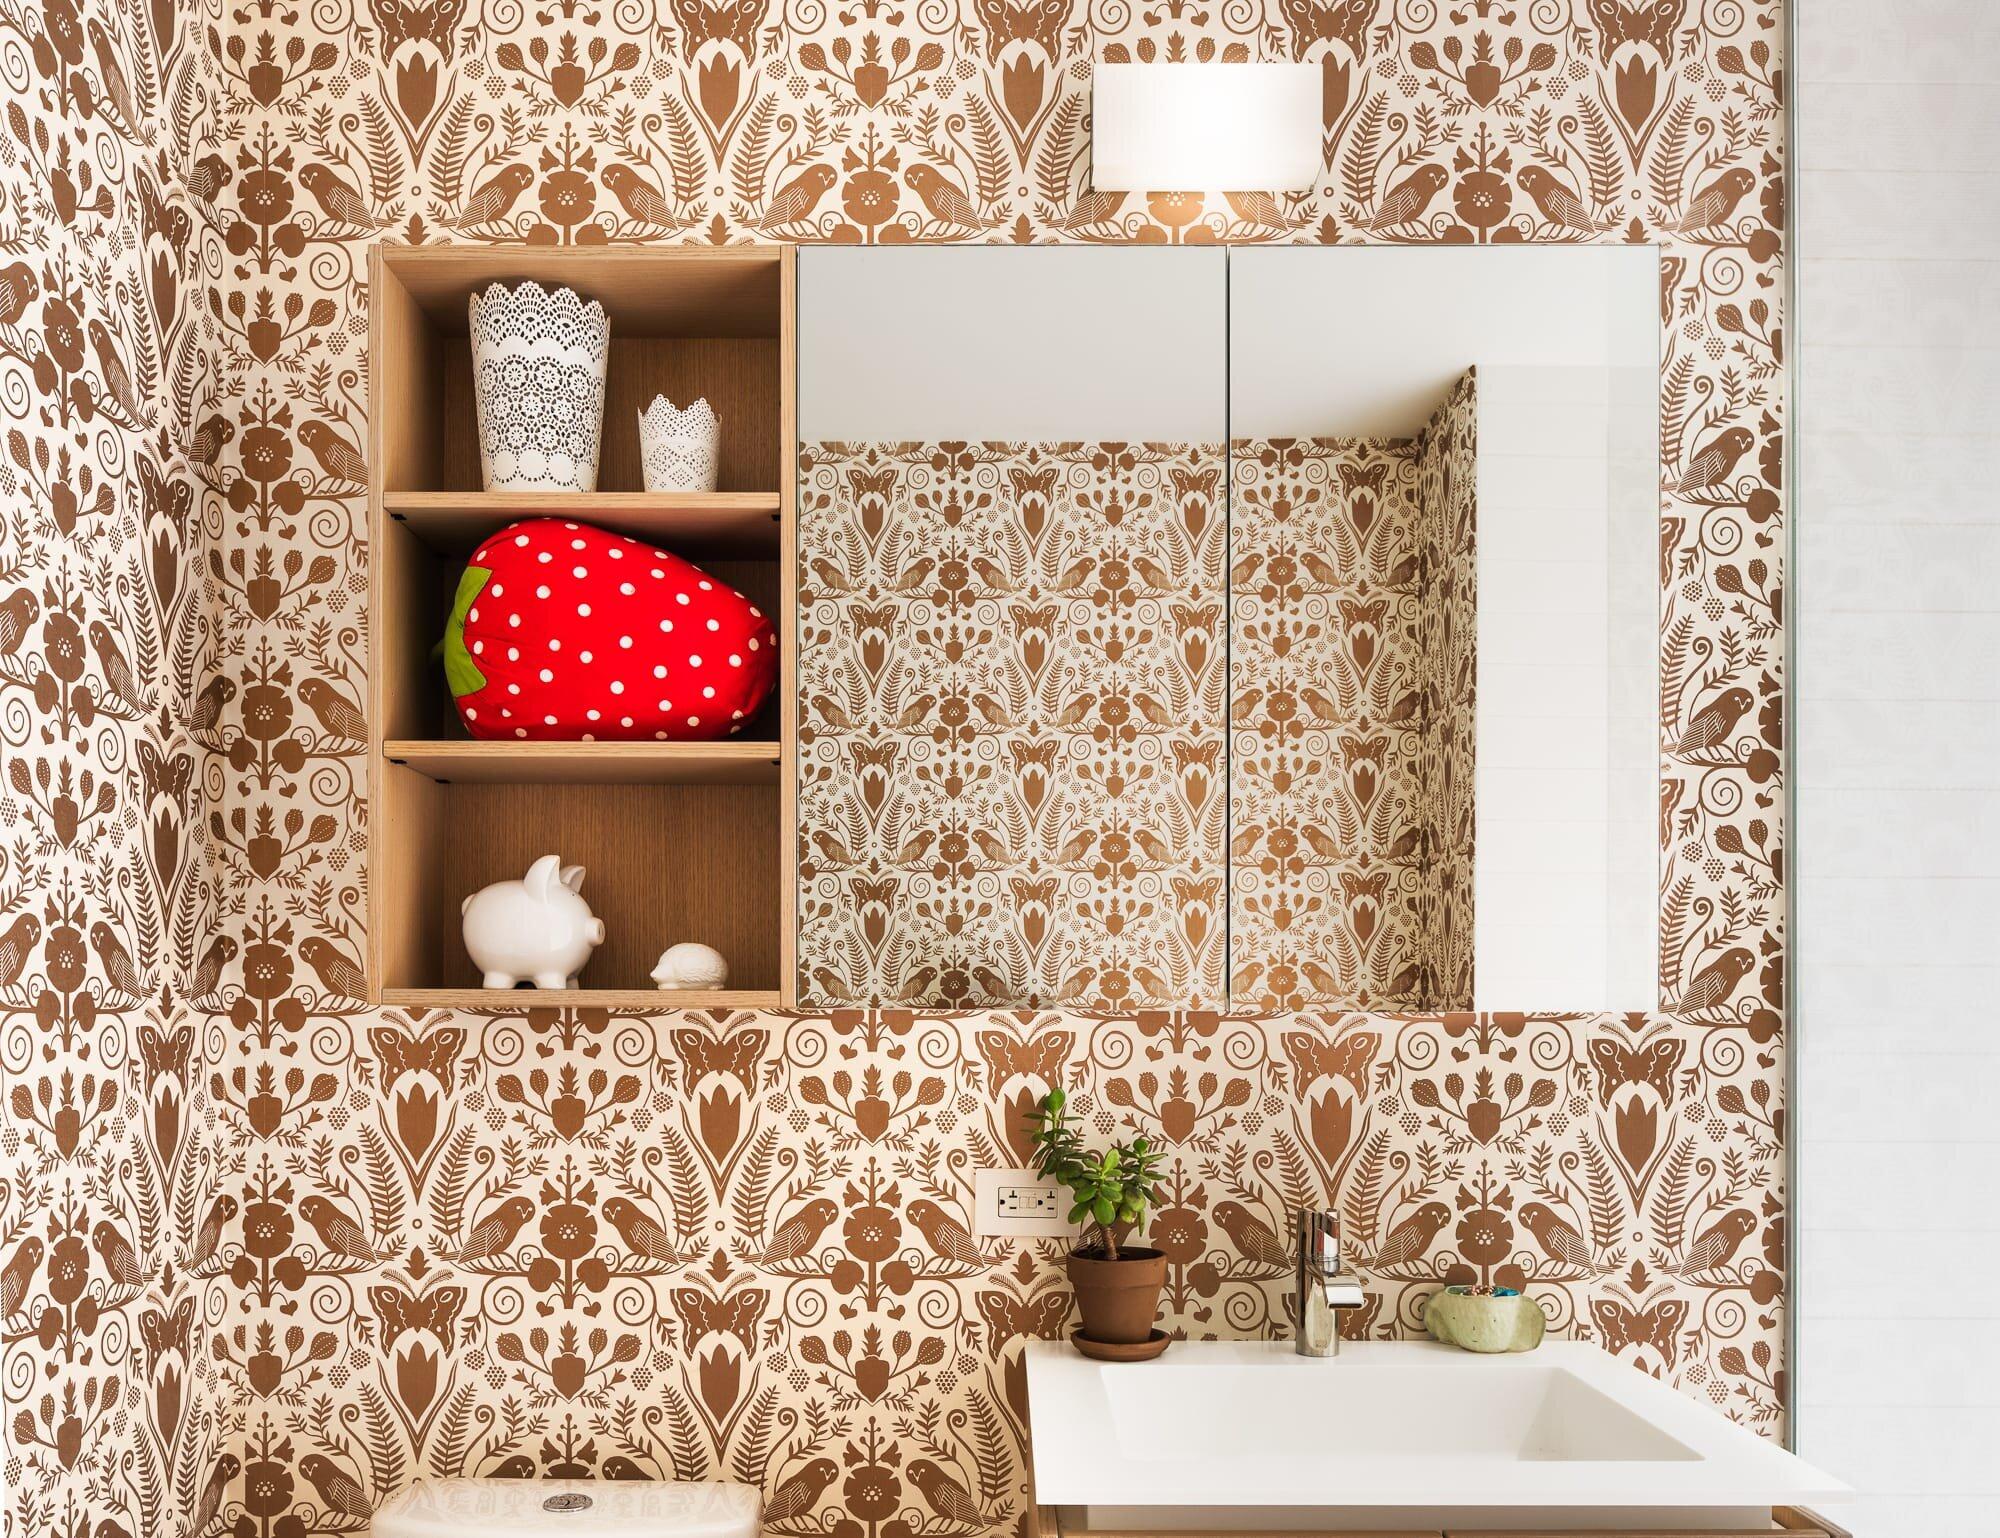 Guest Bathroom details designed by Alloy Development